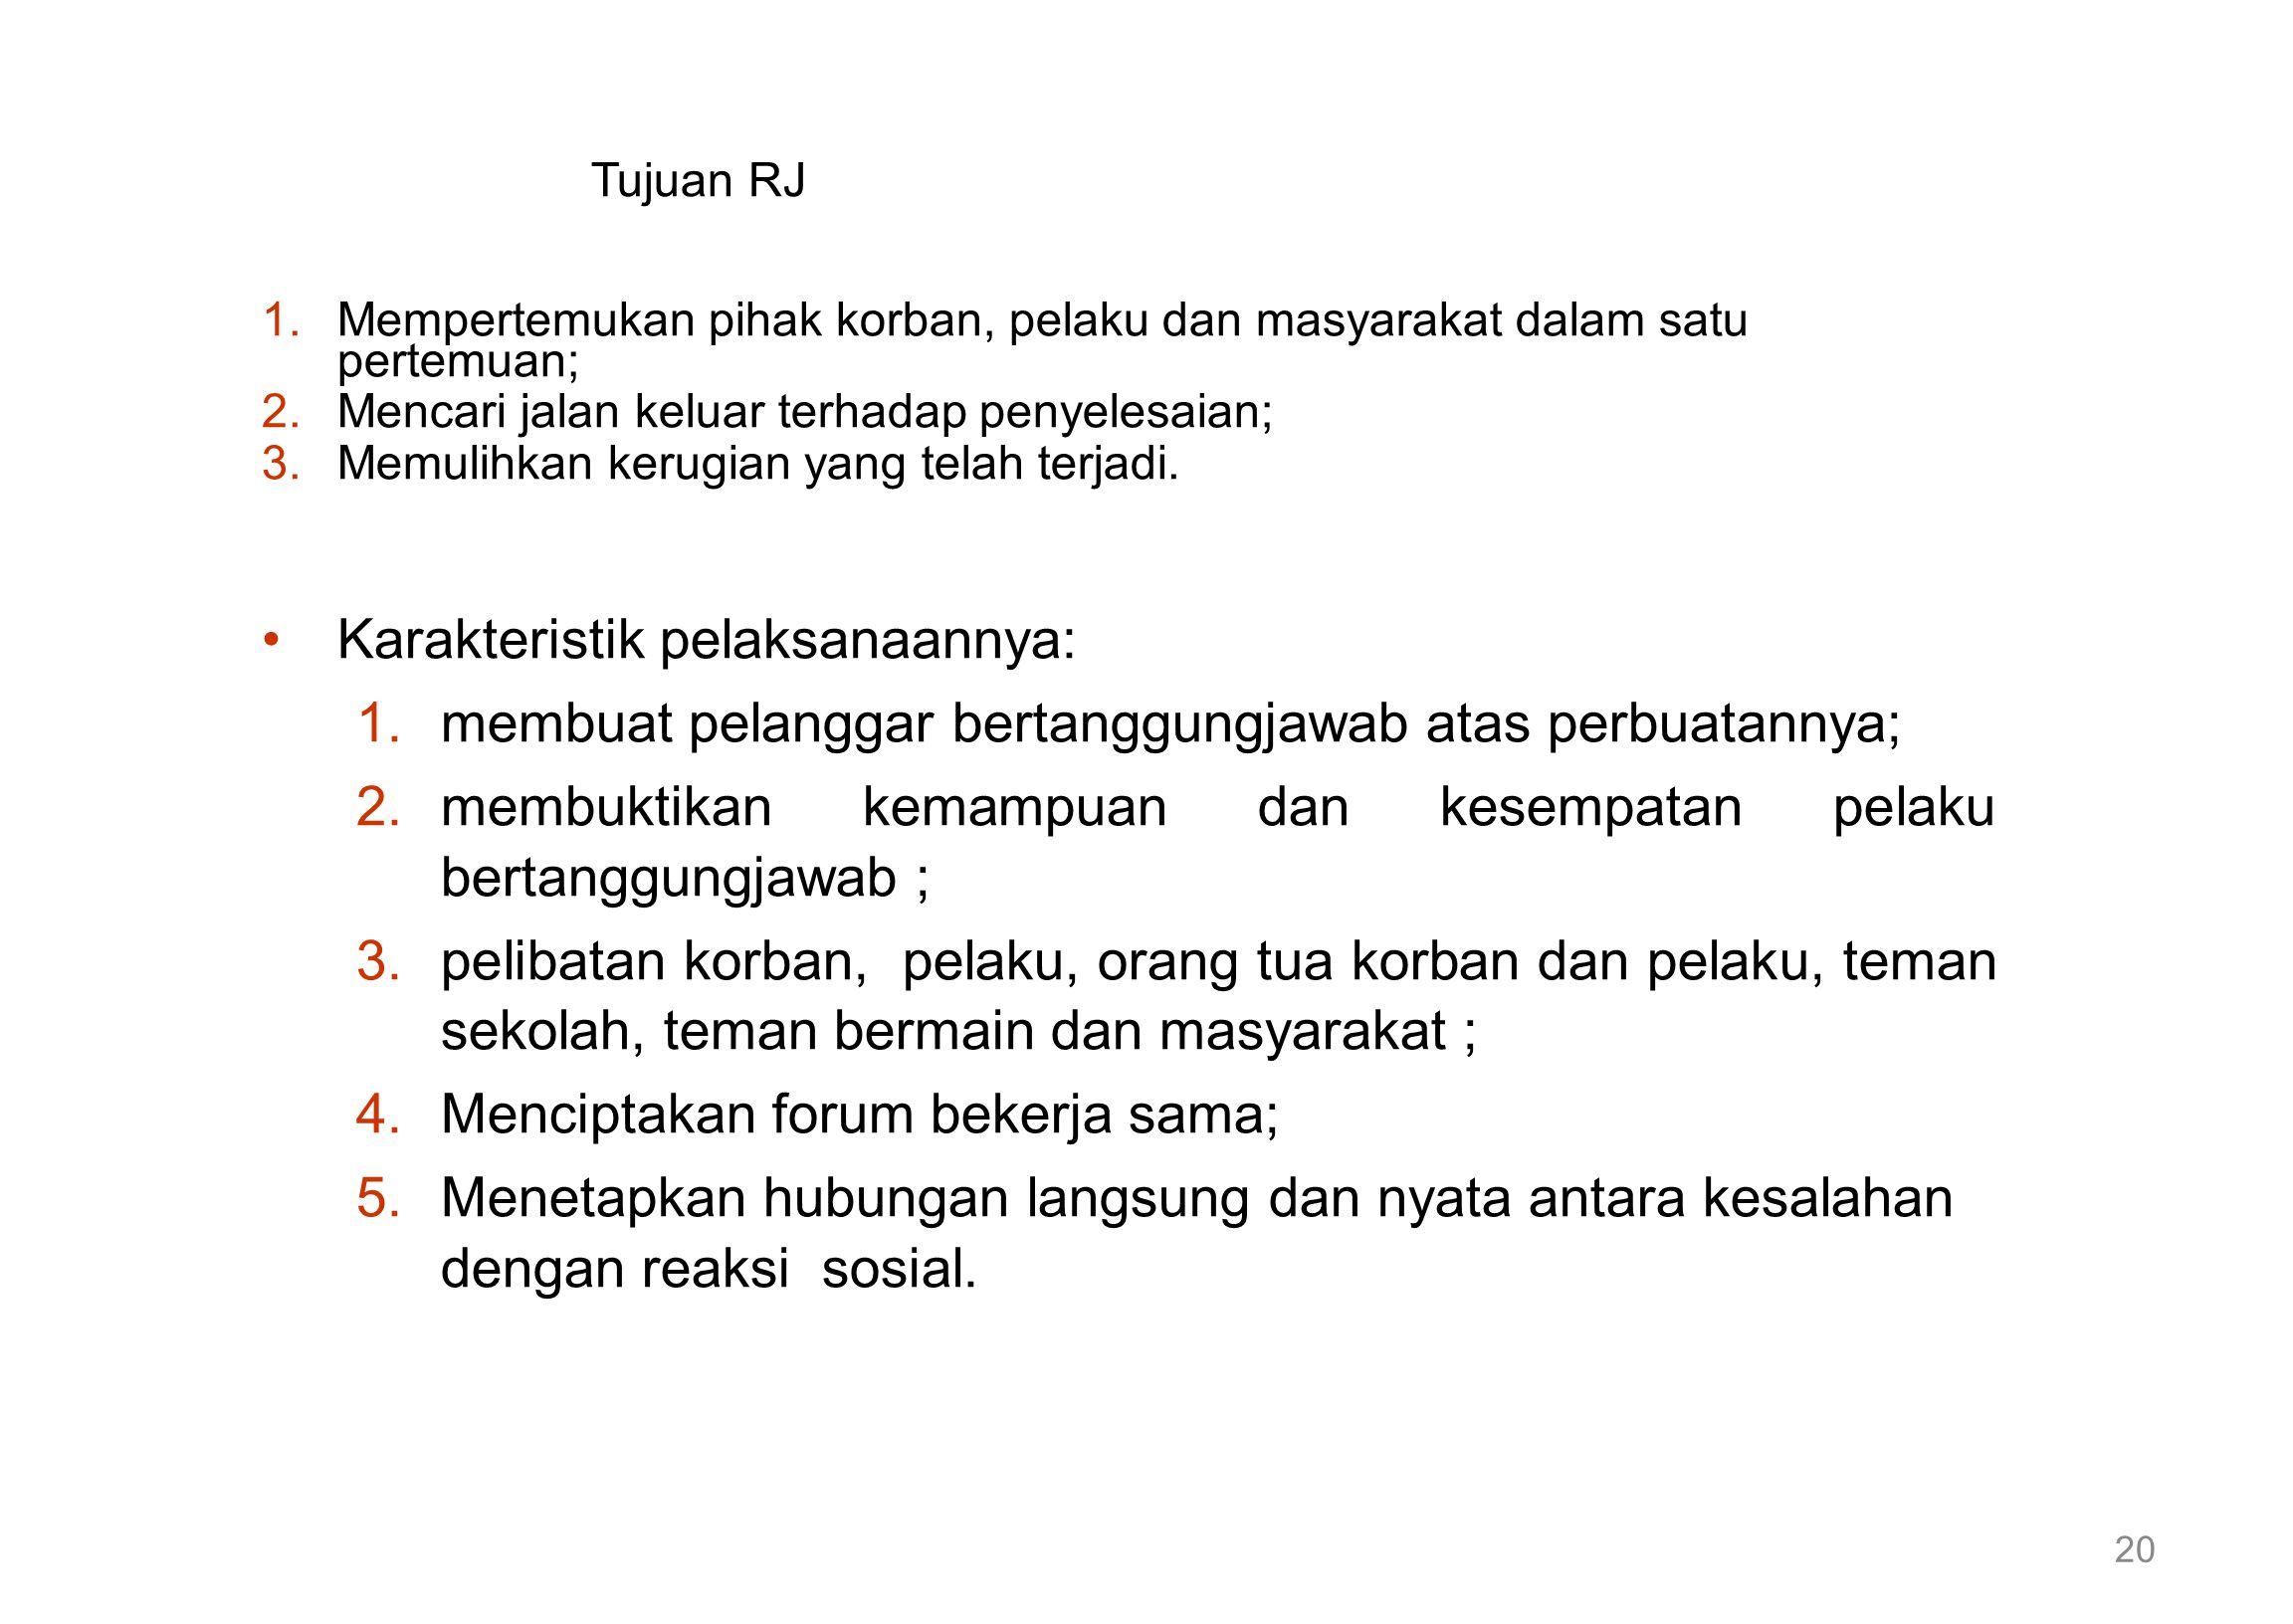 Karakteristik pelaksanaannya: